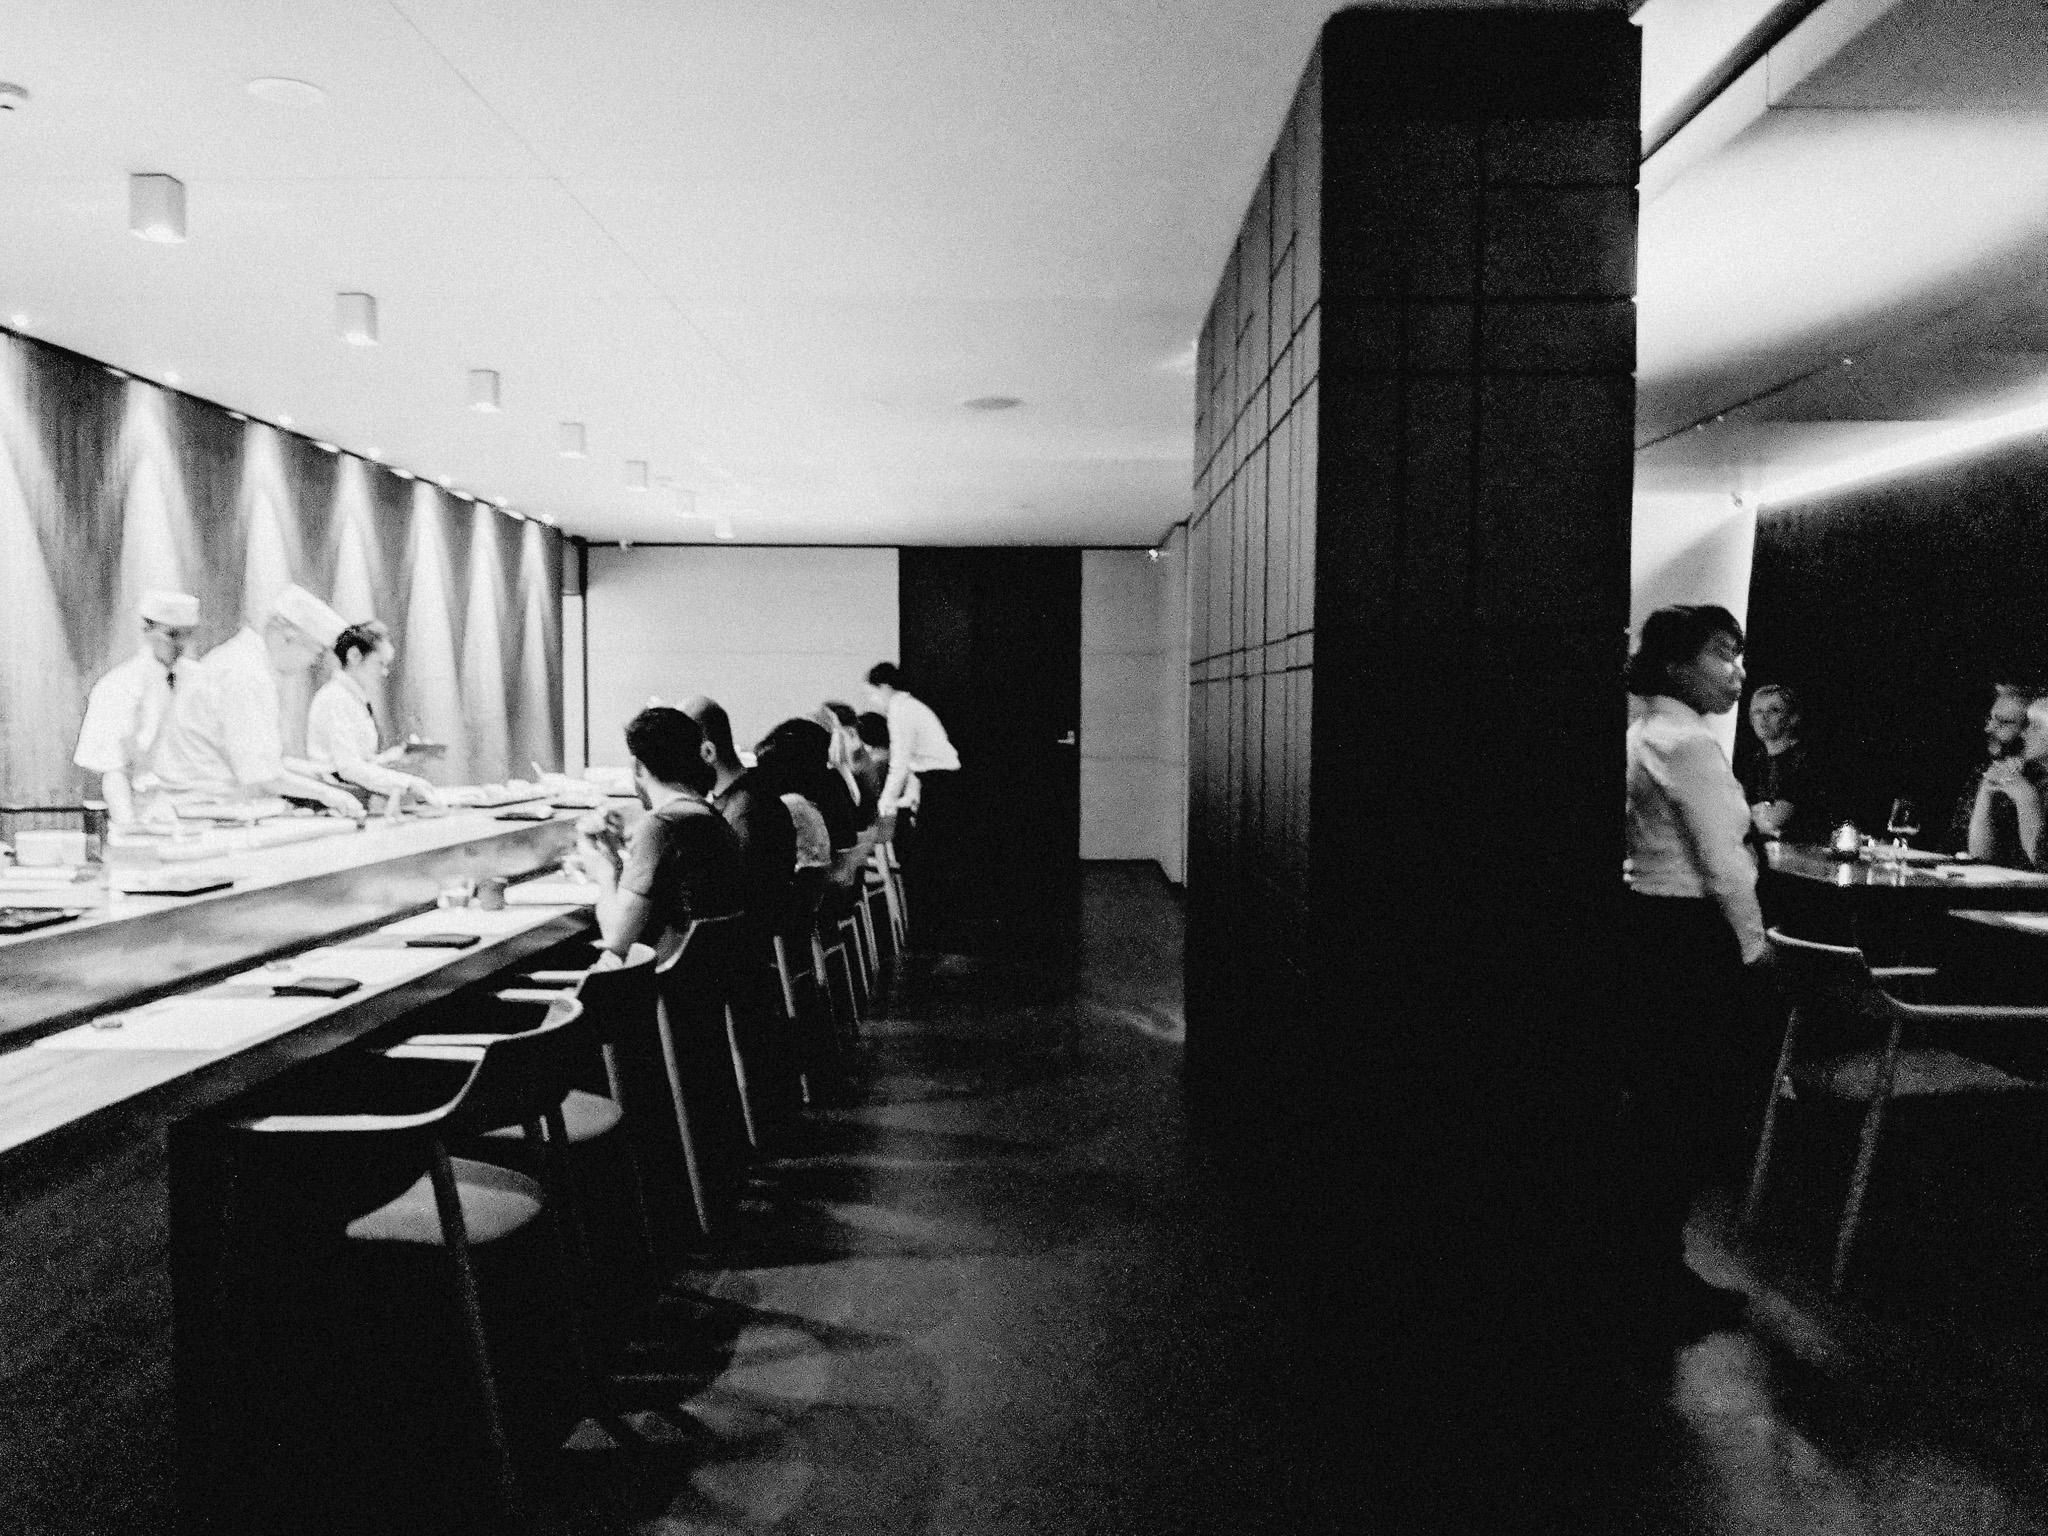 minamishima-melbourne-food-photographer-023.JPG